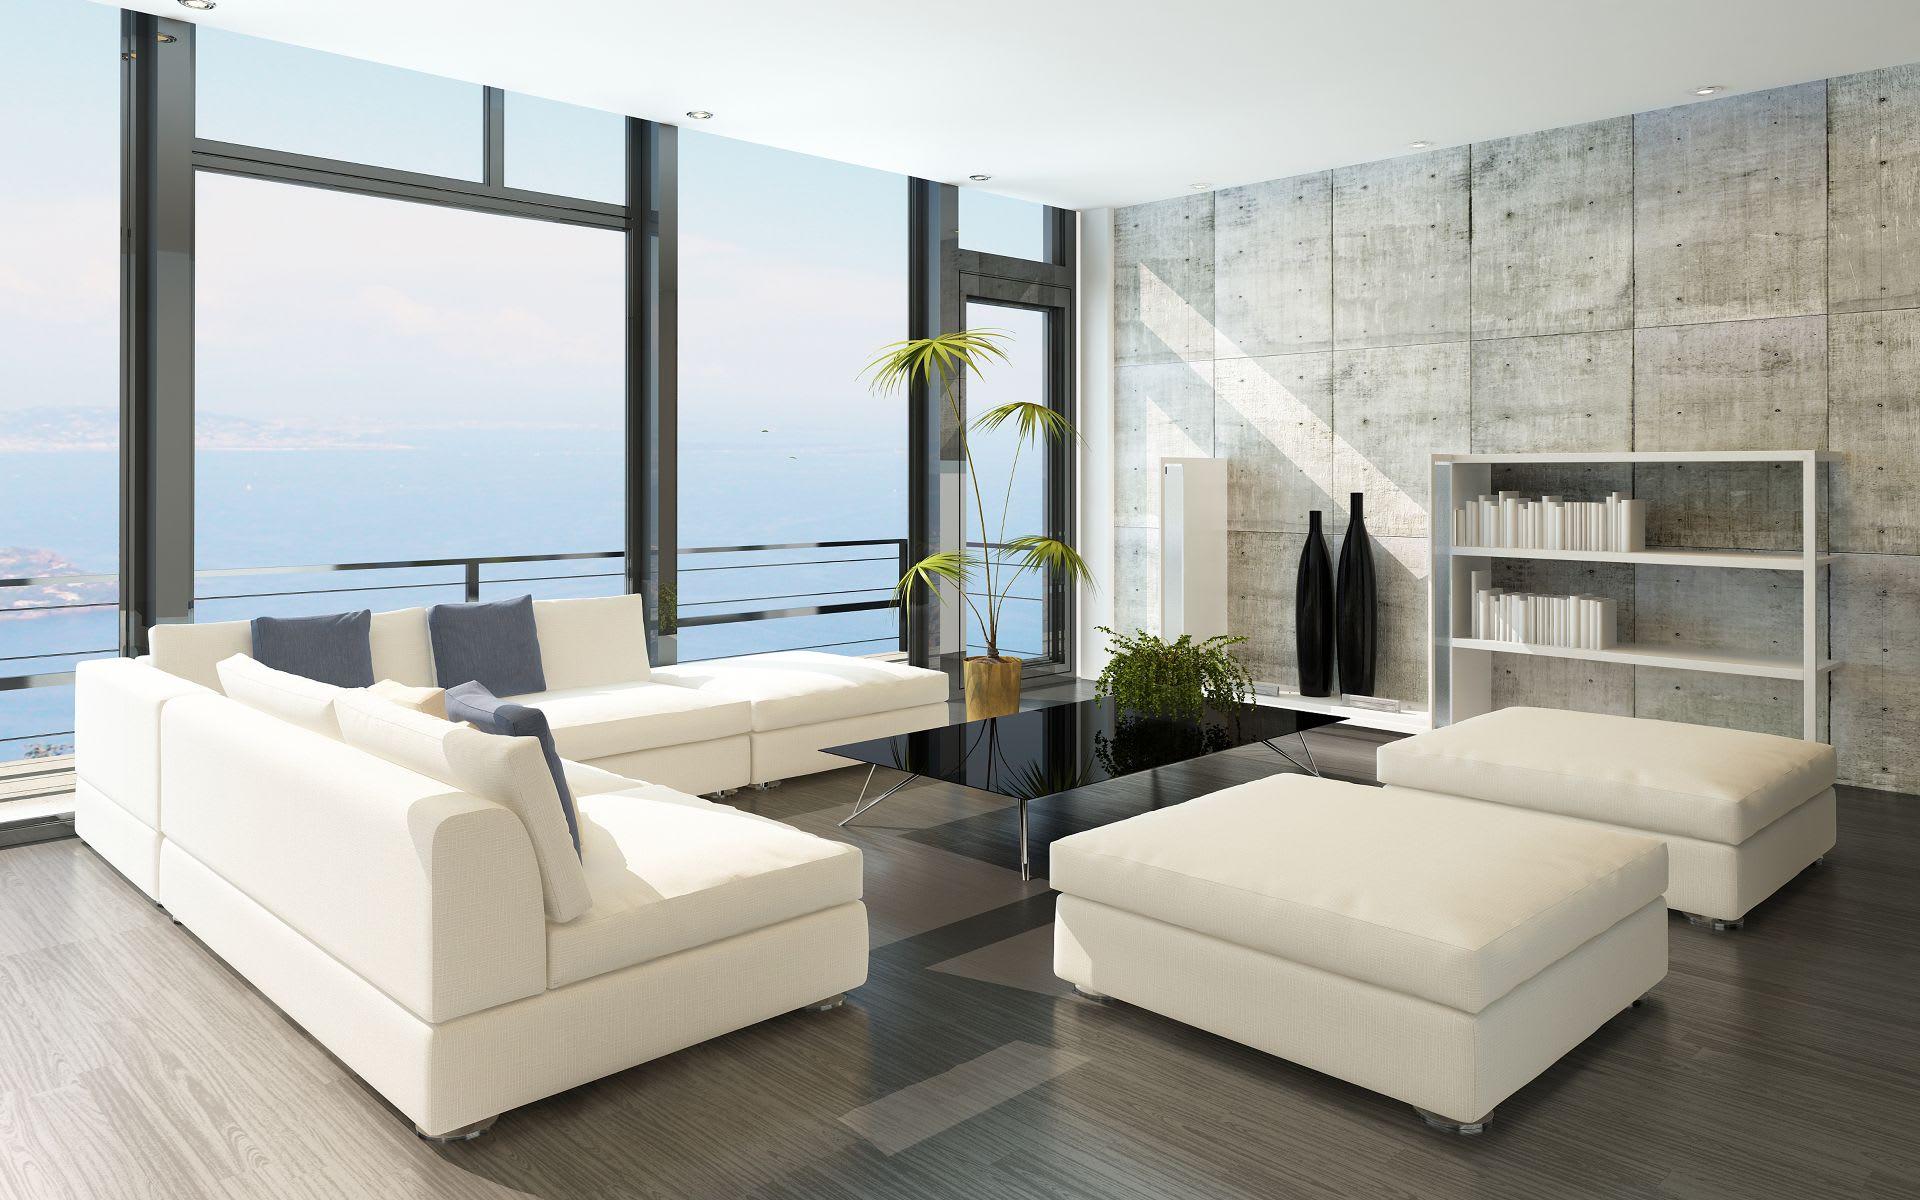 Steel and glass Belvedere cliffside home seeks $7.9 million